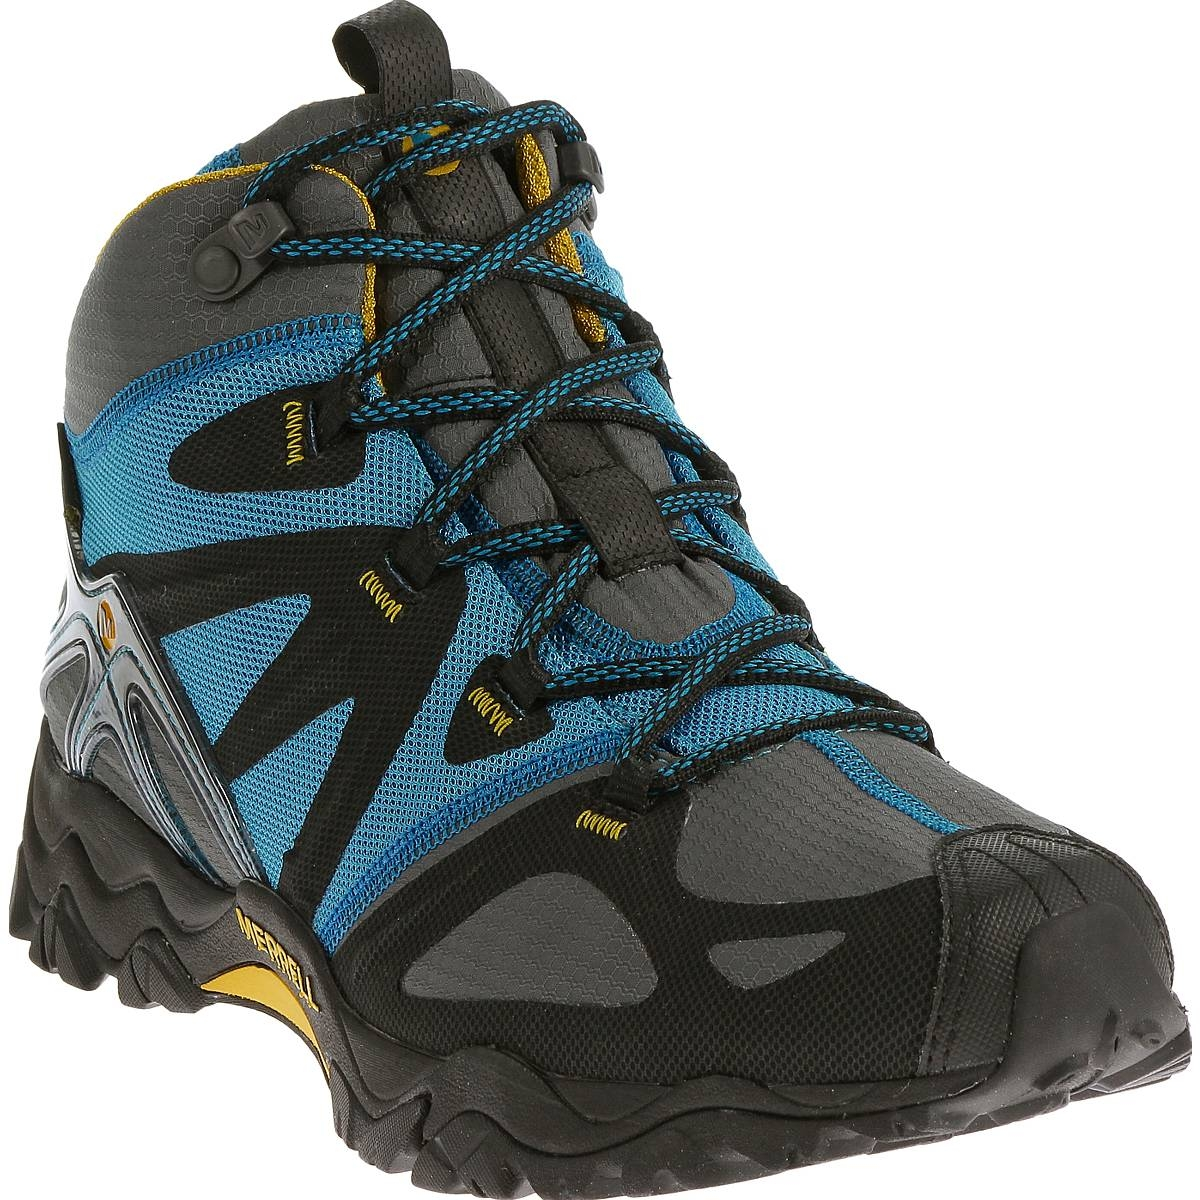 ... Image of Merrell Grassbow Mid Sport GTX Walking Boots (Men's) - Racer  Blue ...